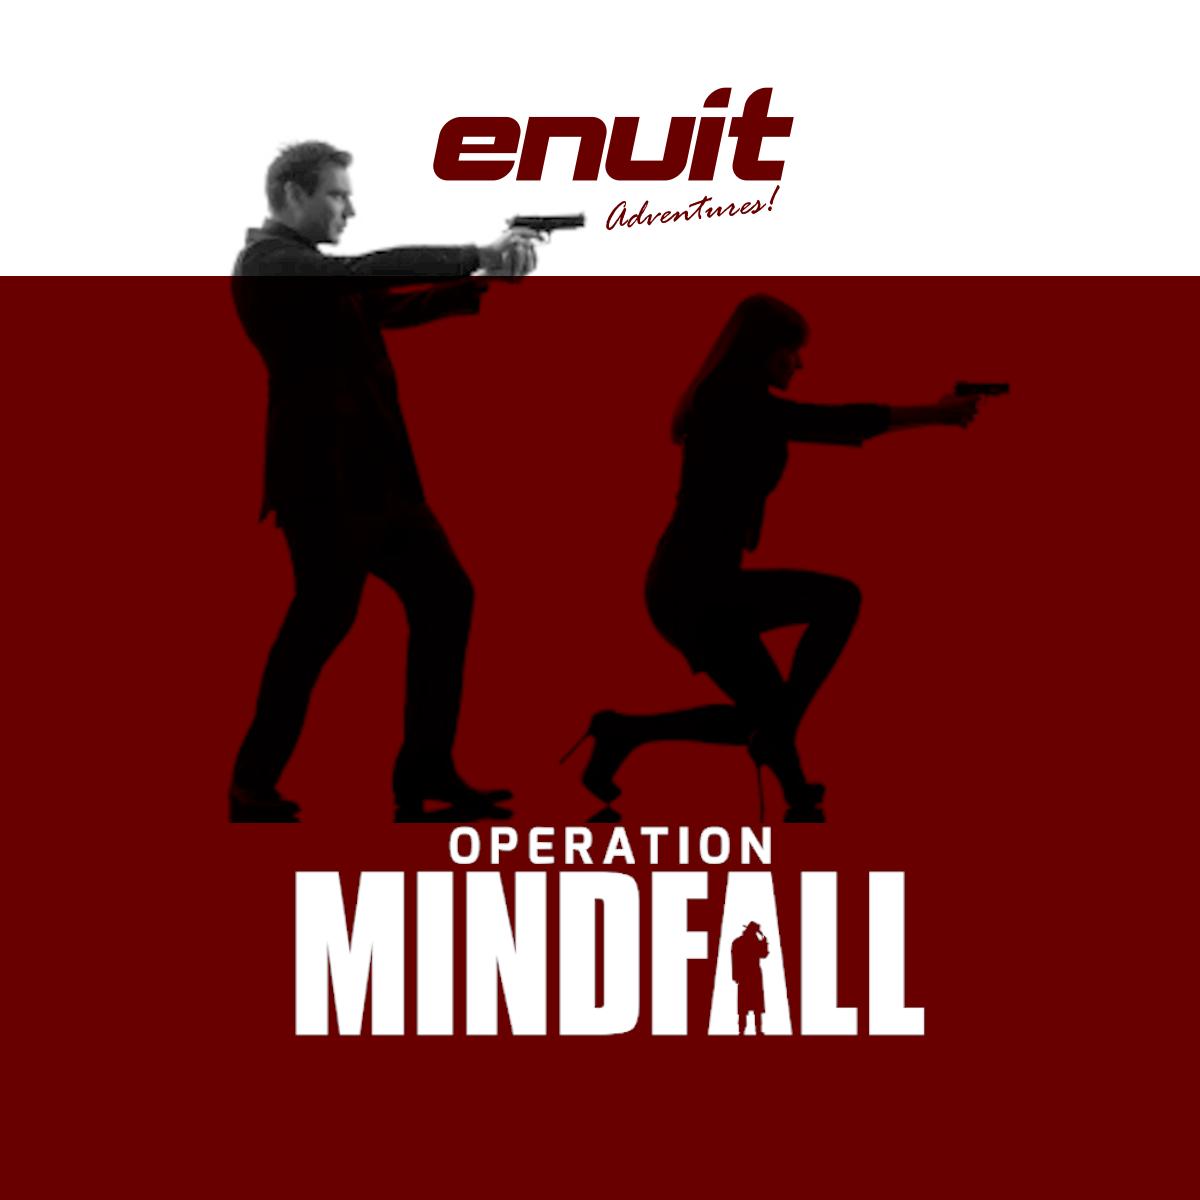 Outdoor-Abenteuer: Operation Mindfall (Chur)